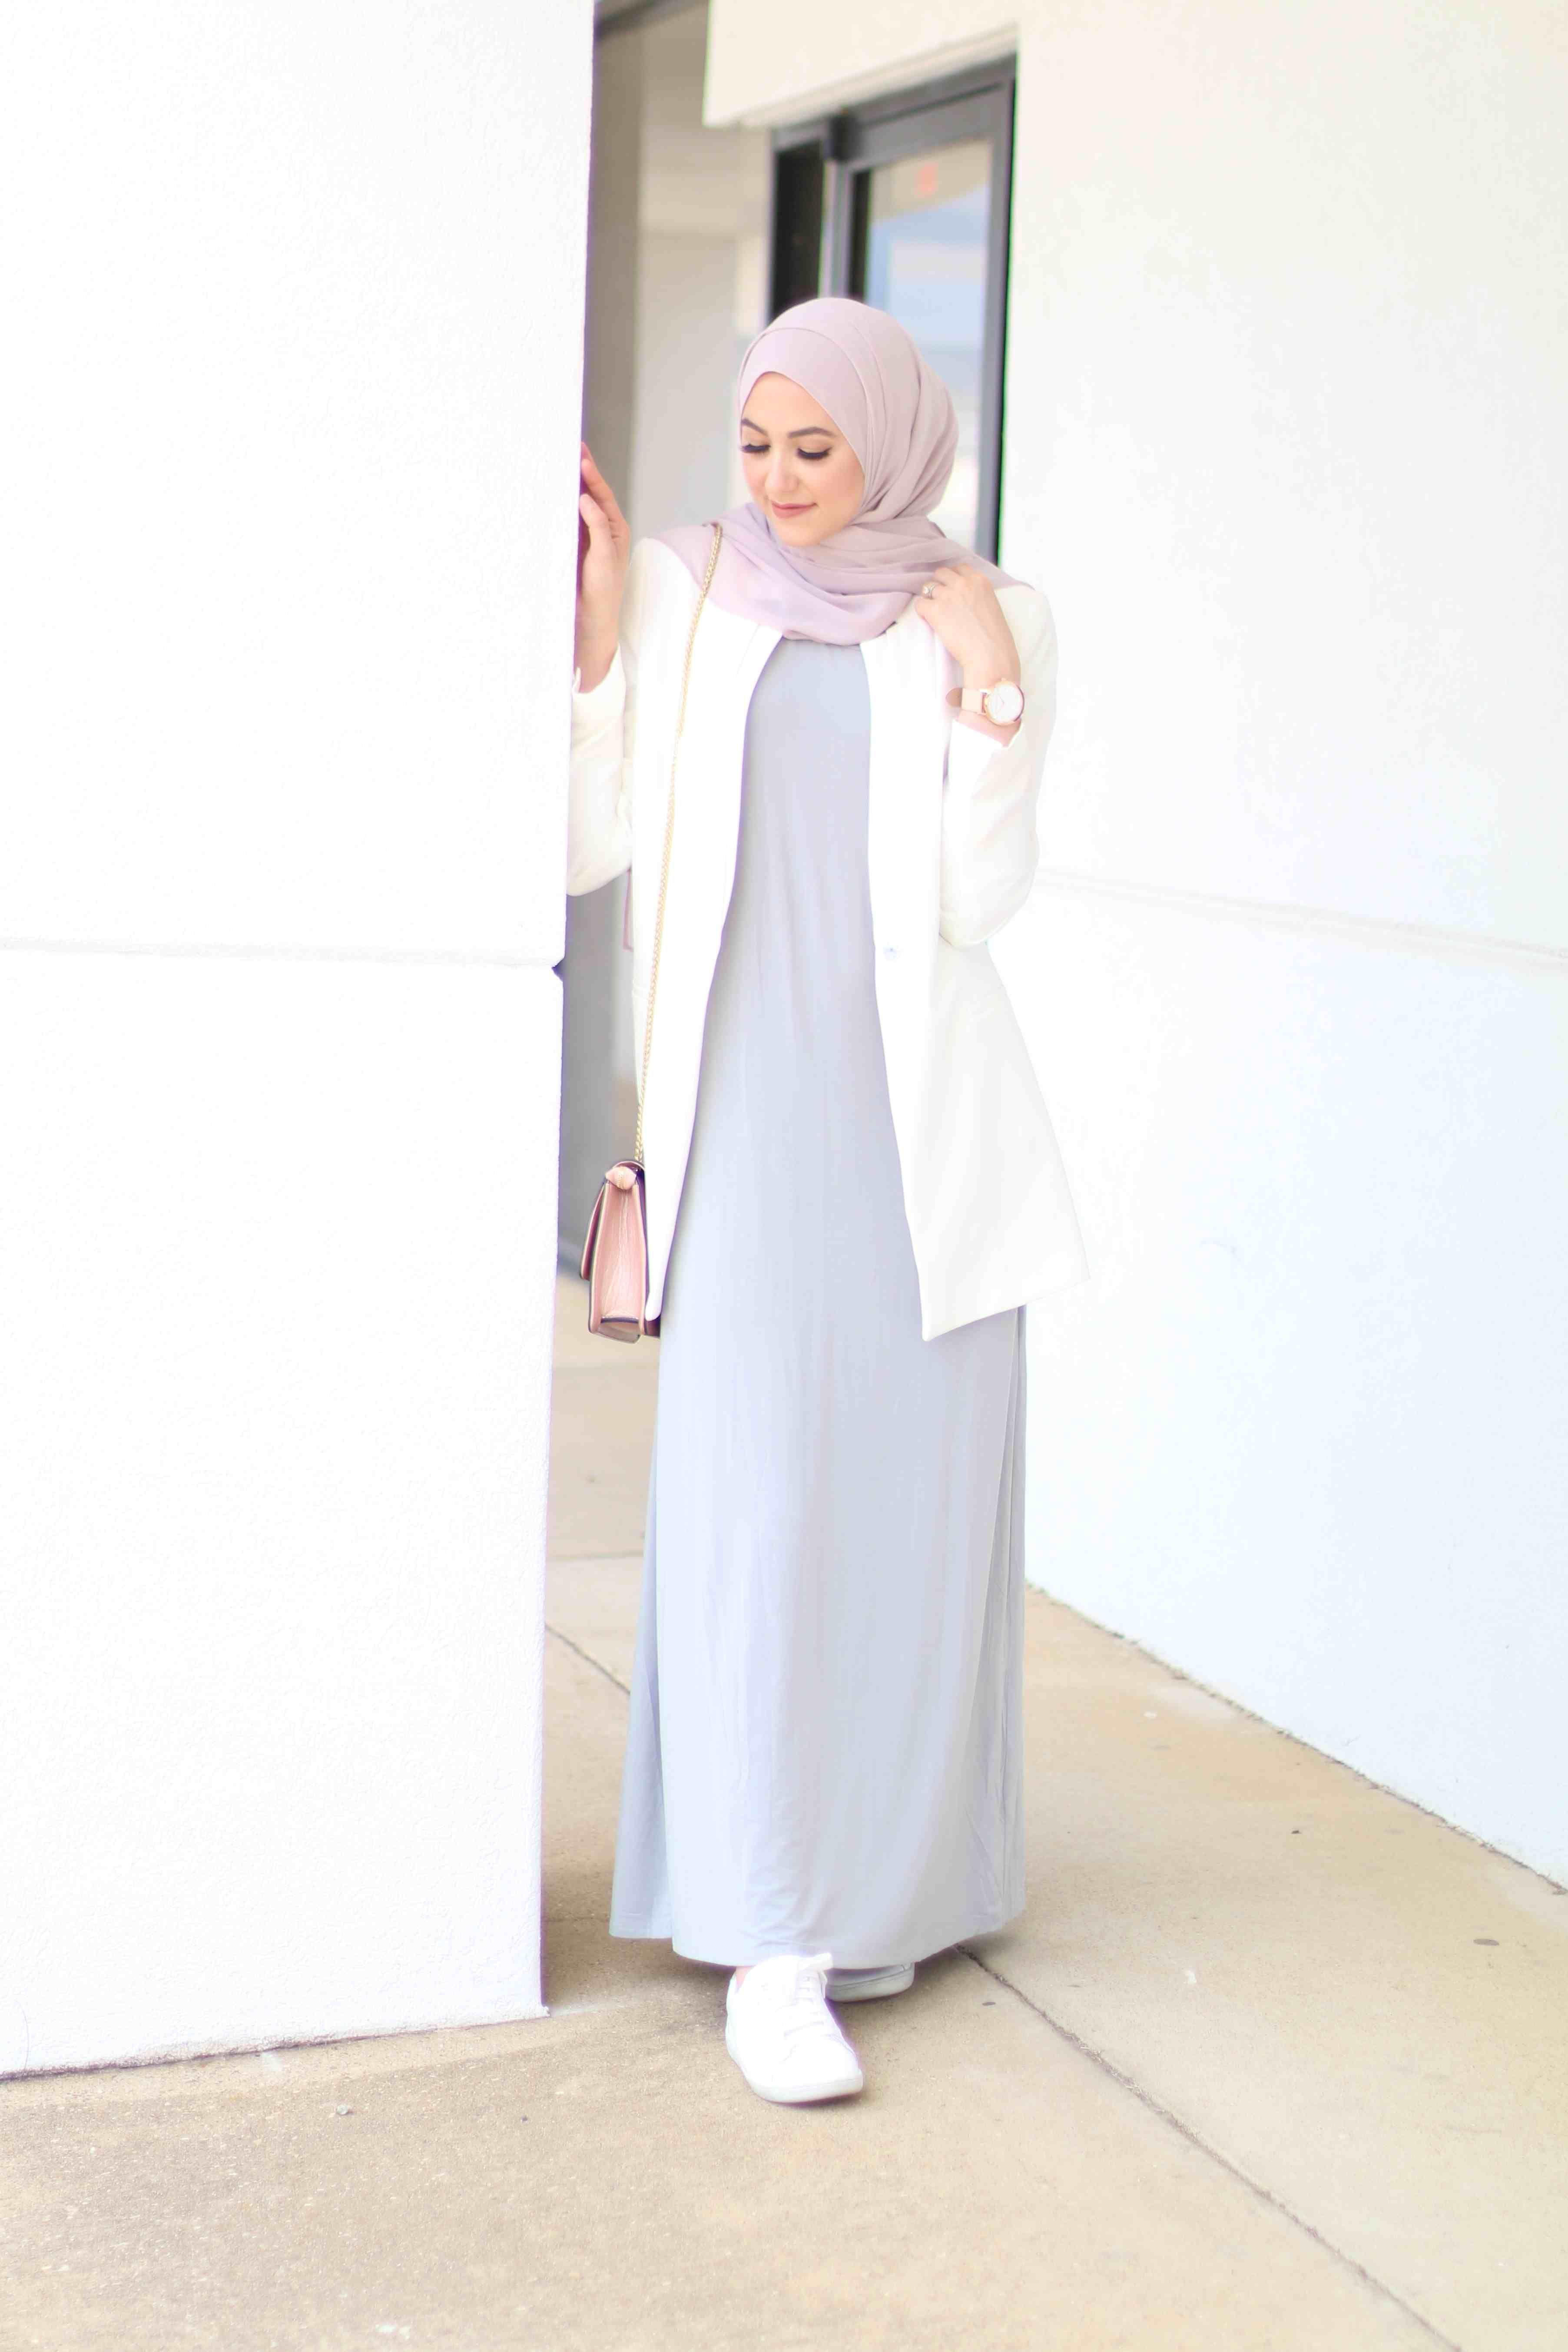 With Love, Leena. – A Fashion + Lifestyle Blog by Leena ...